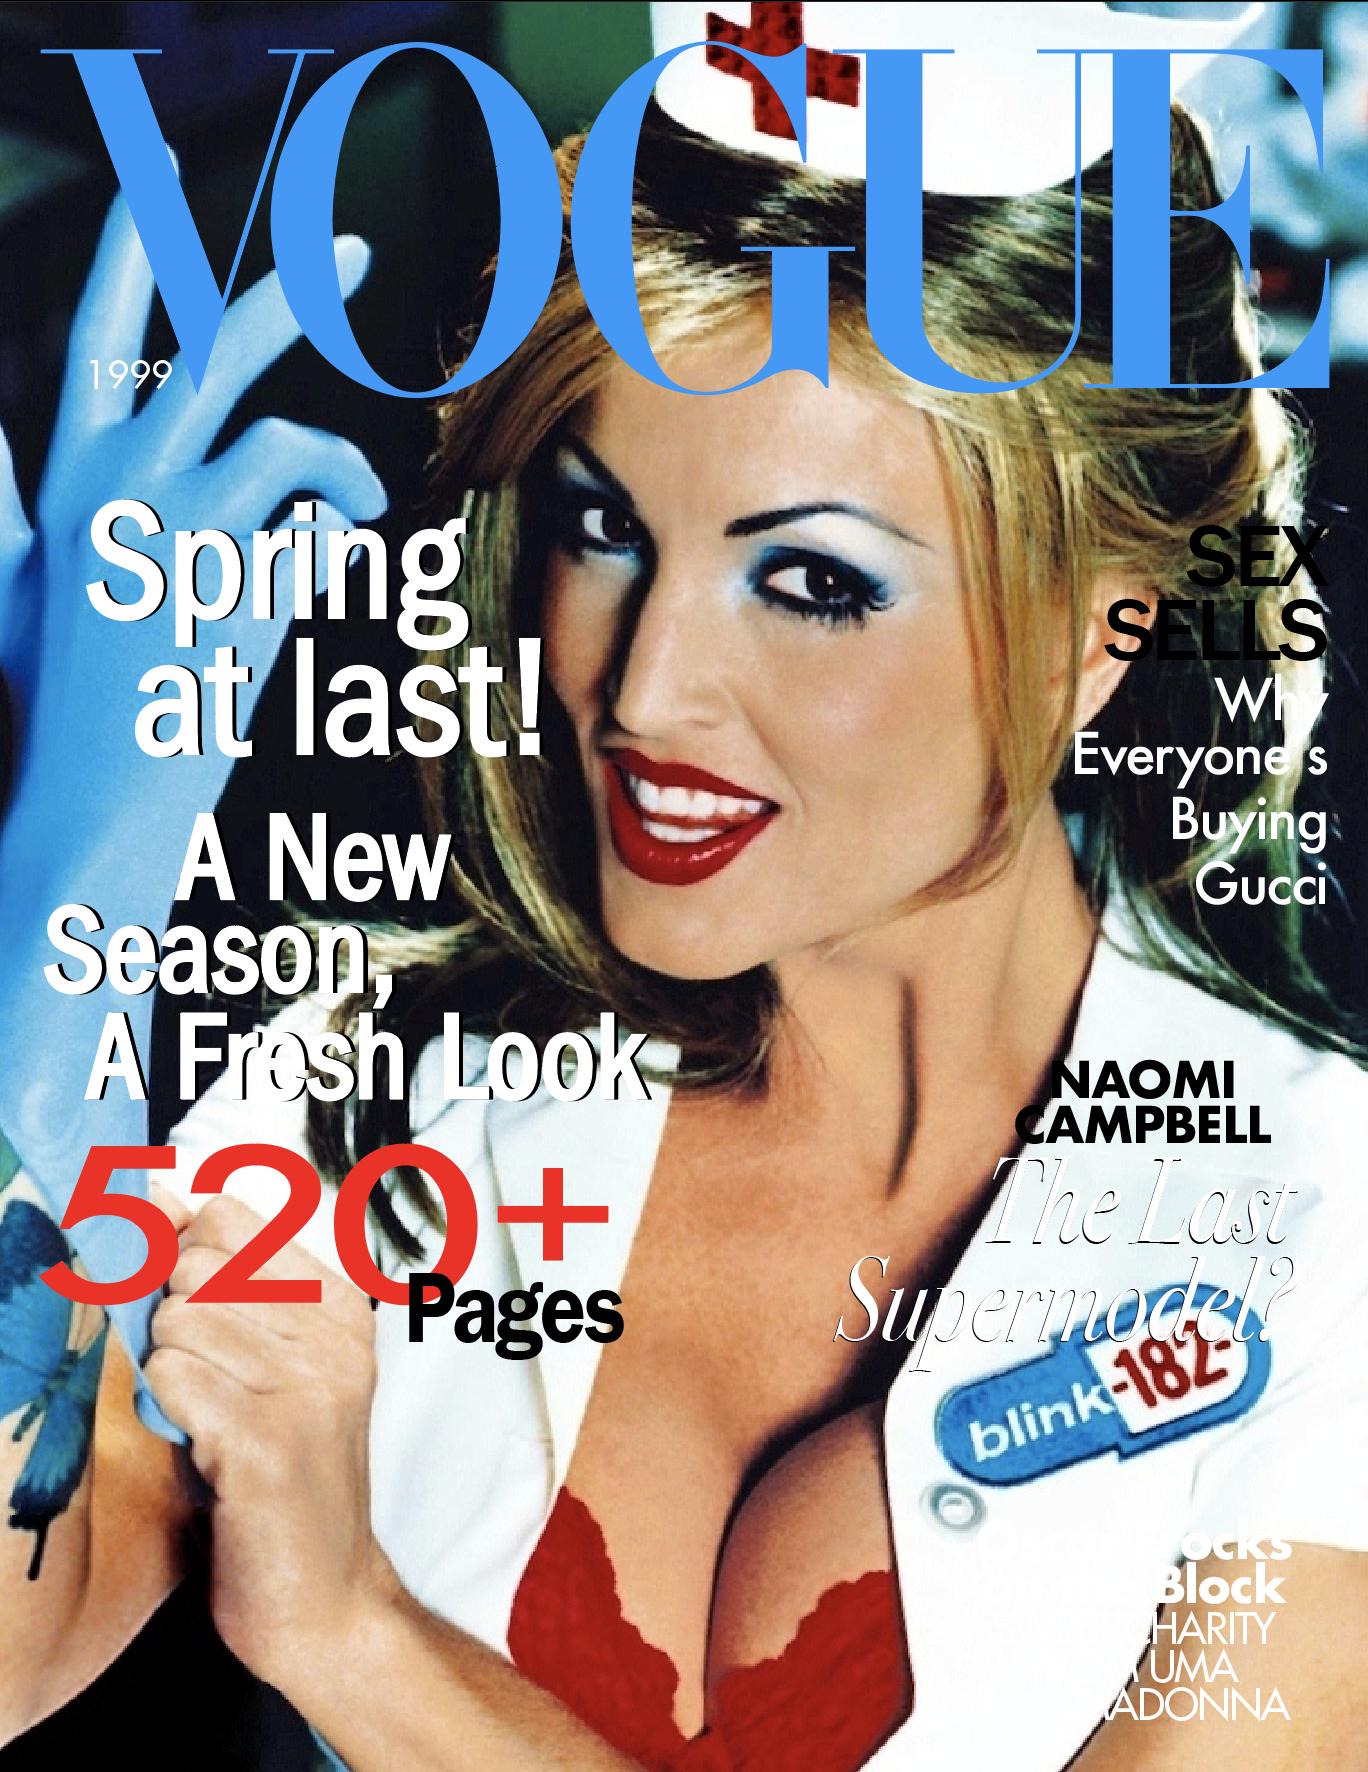 Blink-182/1999 American Vogue